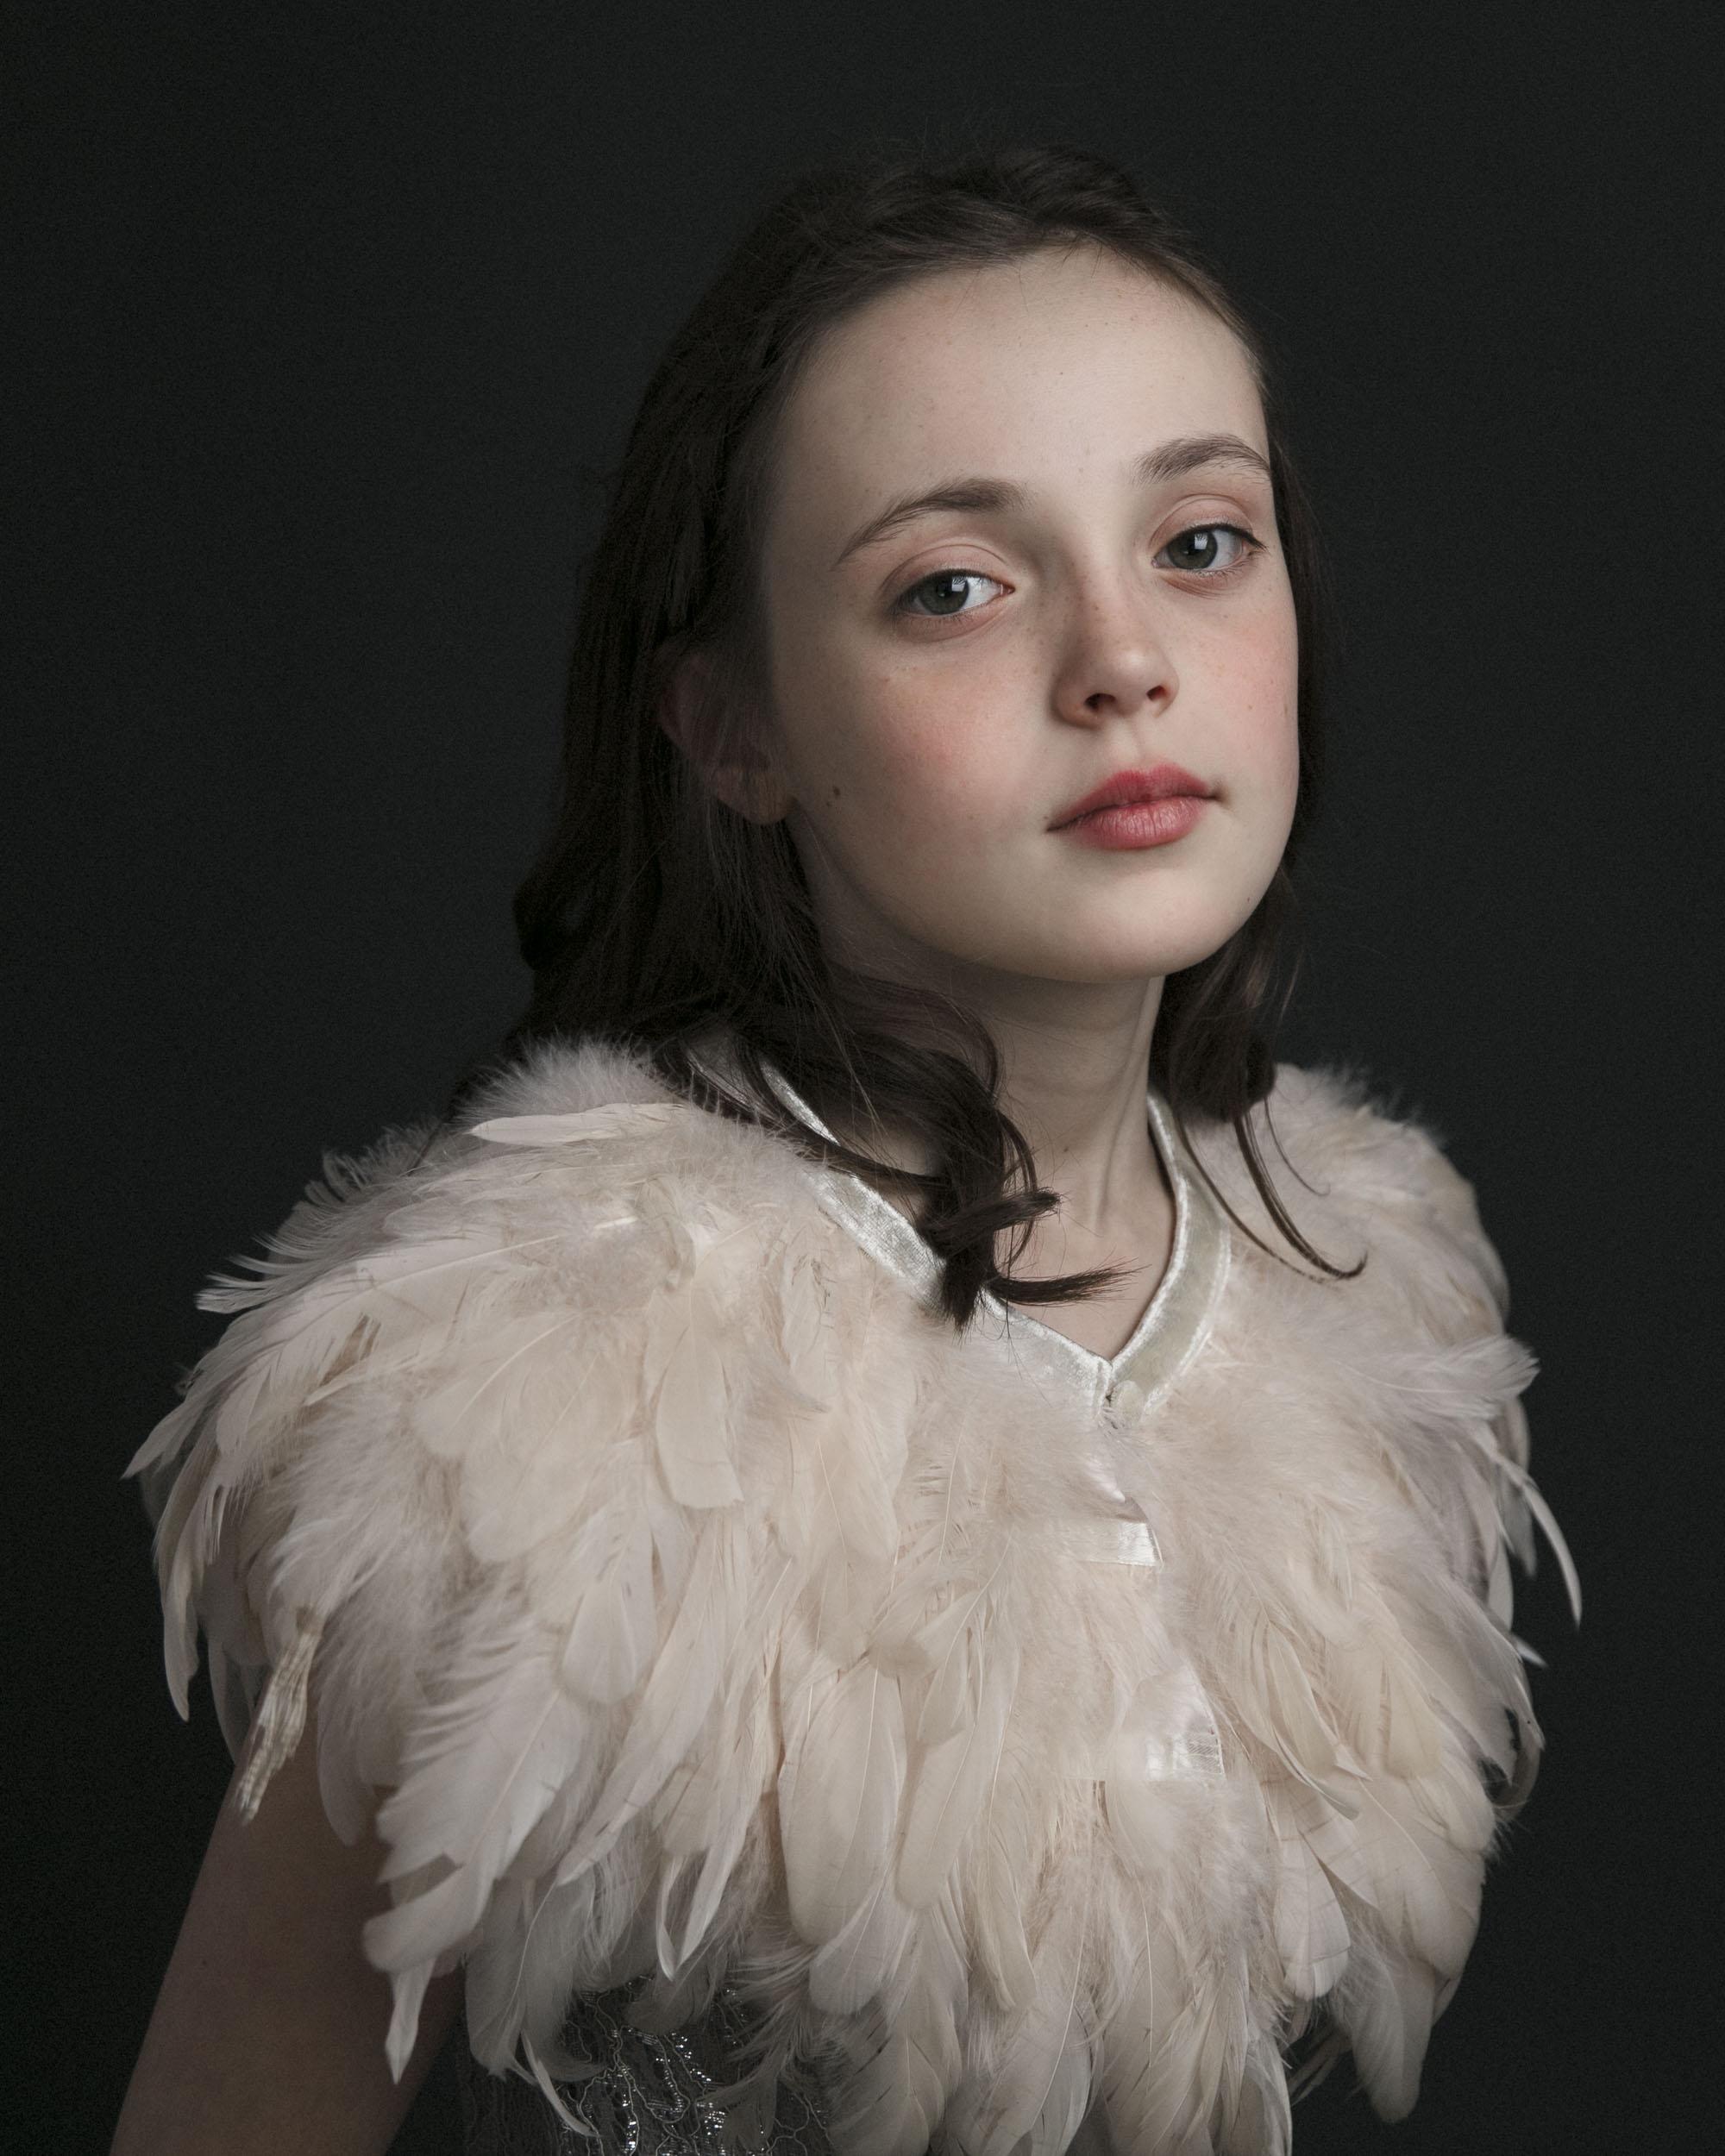 marina-mcdonald-child-portrait-photography-canberra-child-masters-painting